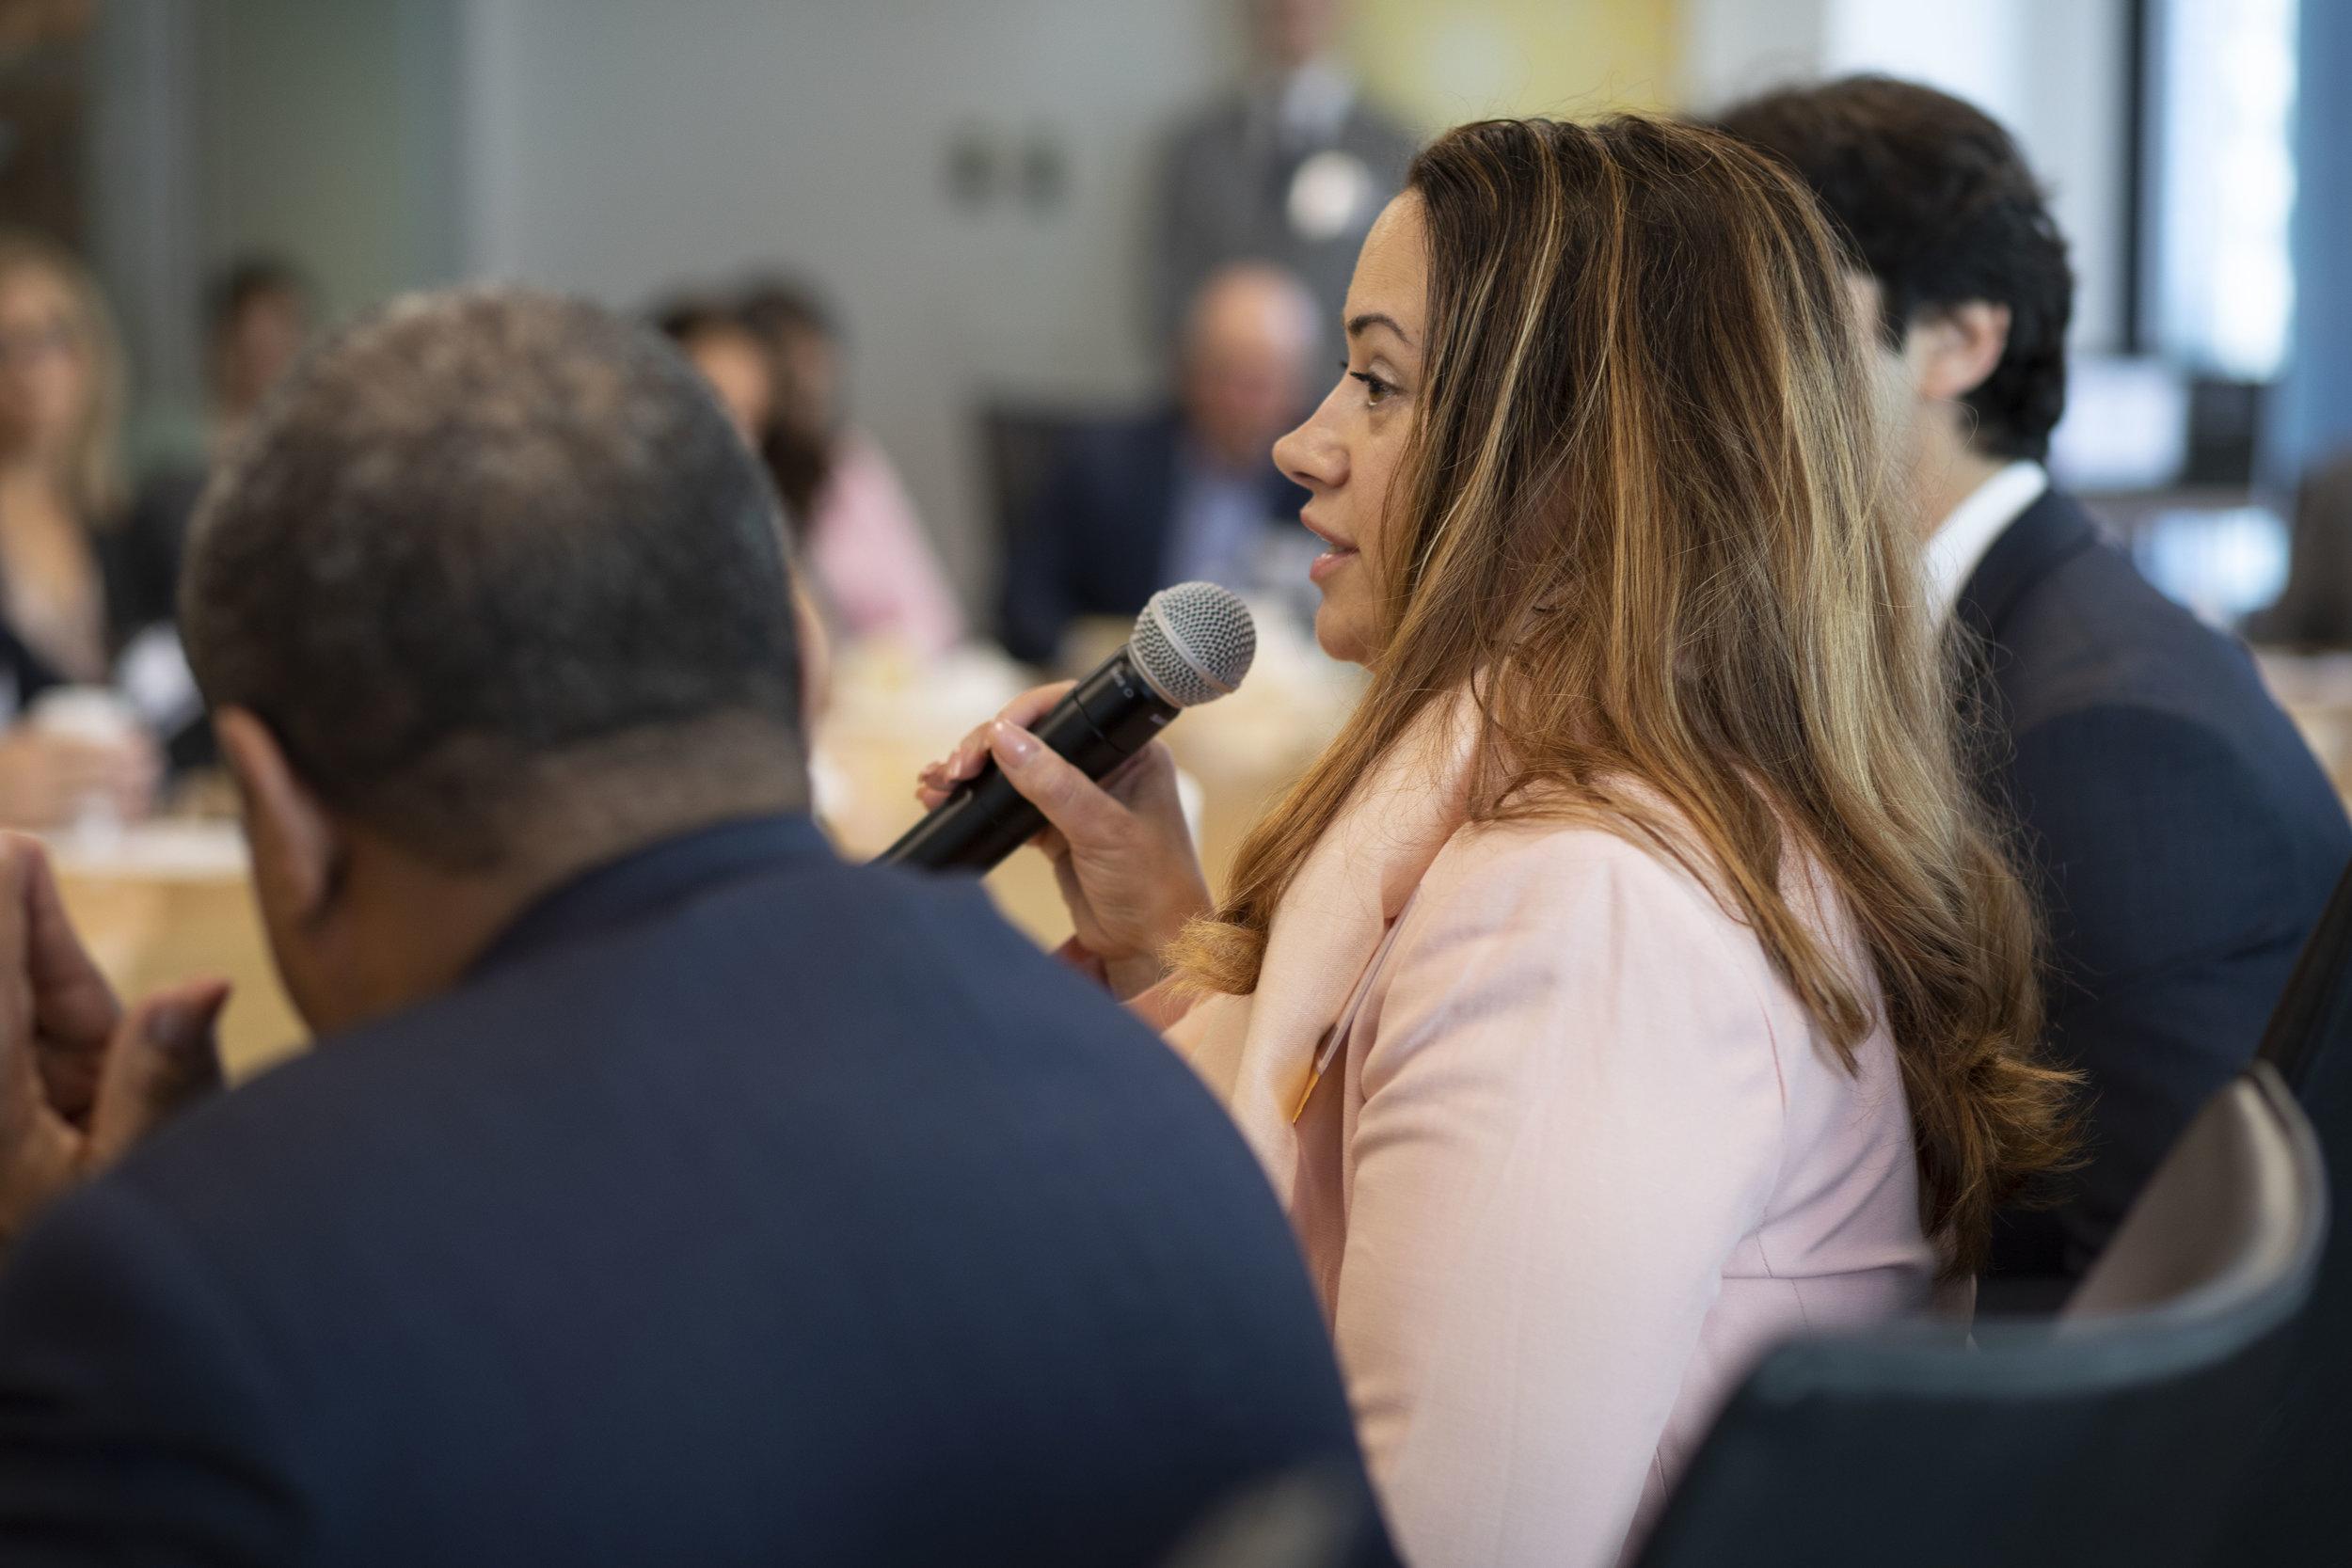 Jennifer Kearney, Executive Partner & Founder, Gotham 360 LLC